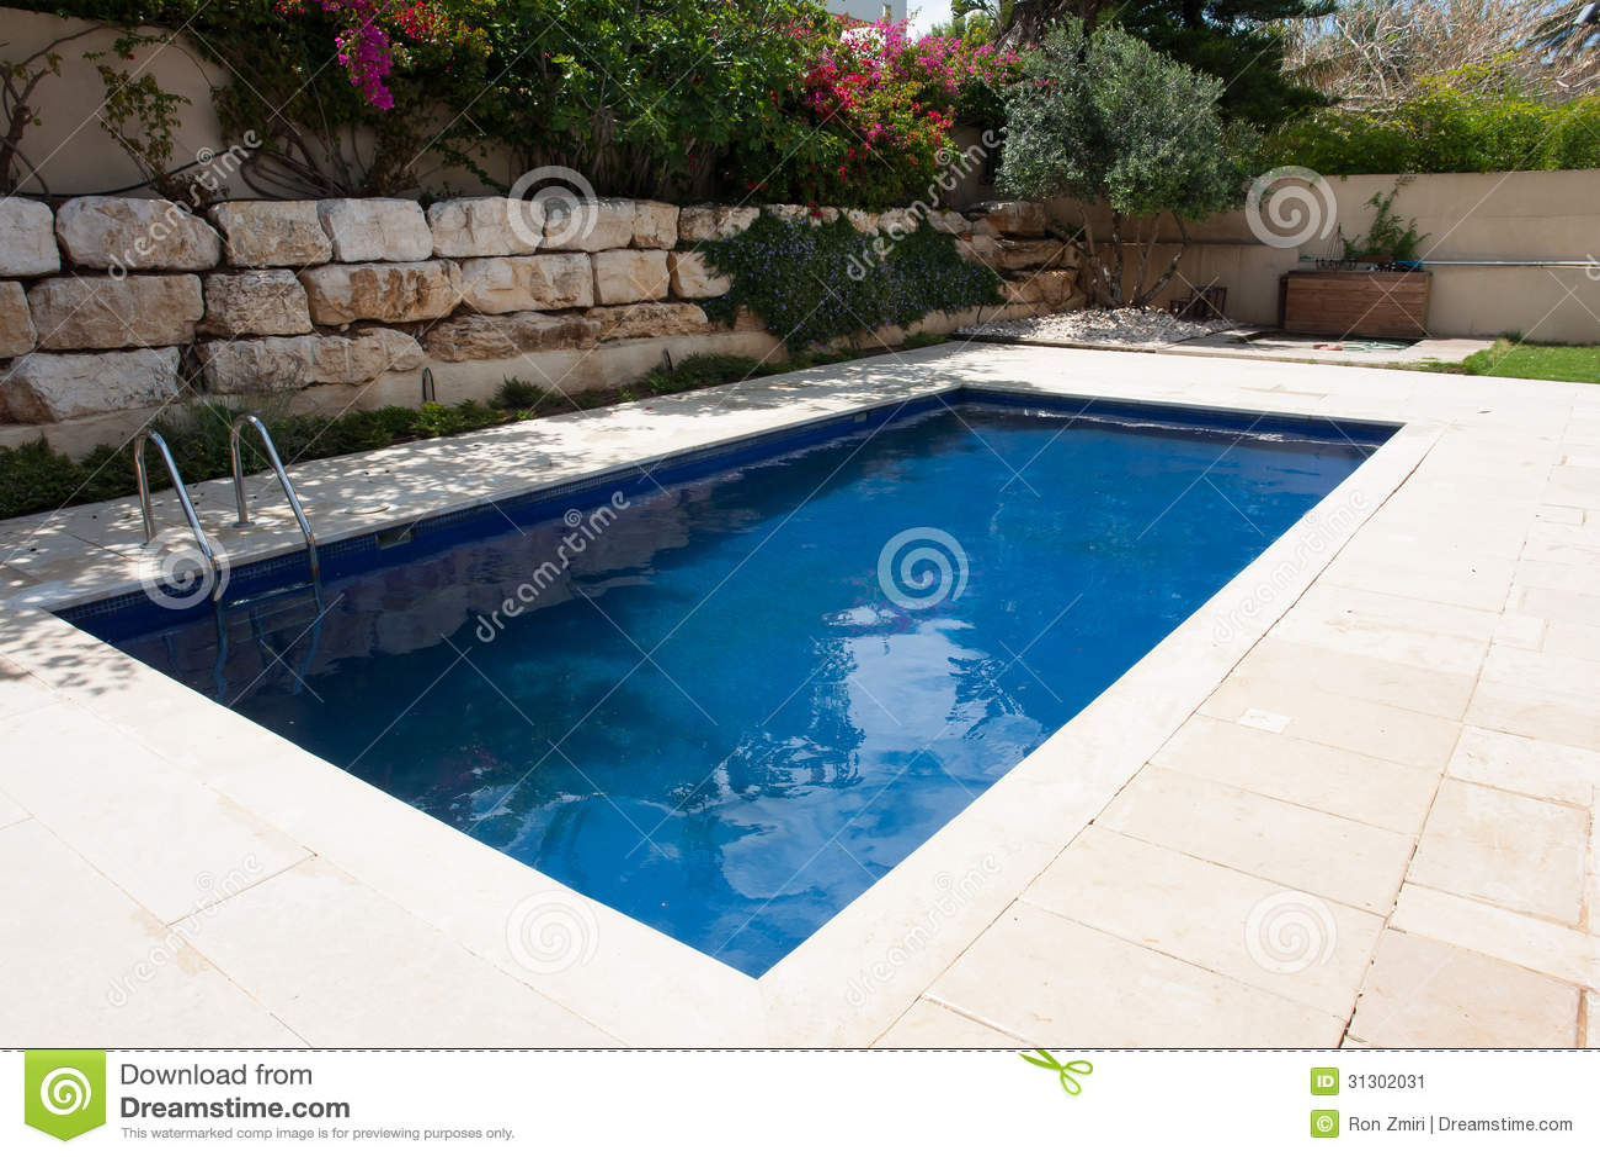 Patio trasero moderno con la piscina imagen de archivo for Patios modernos con piscina